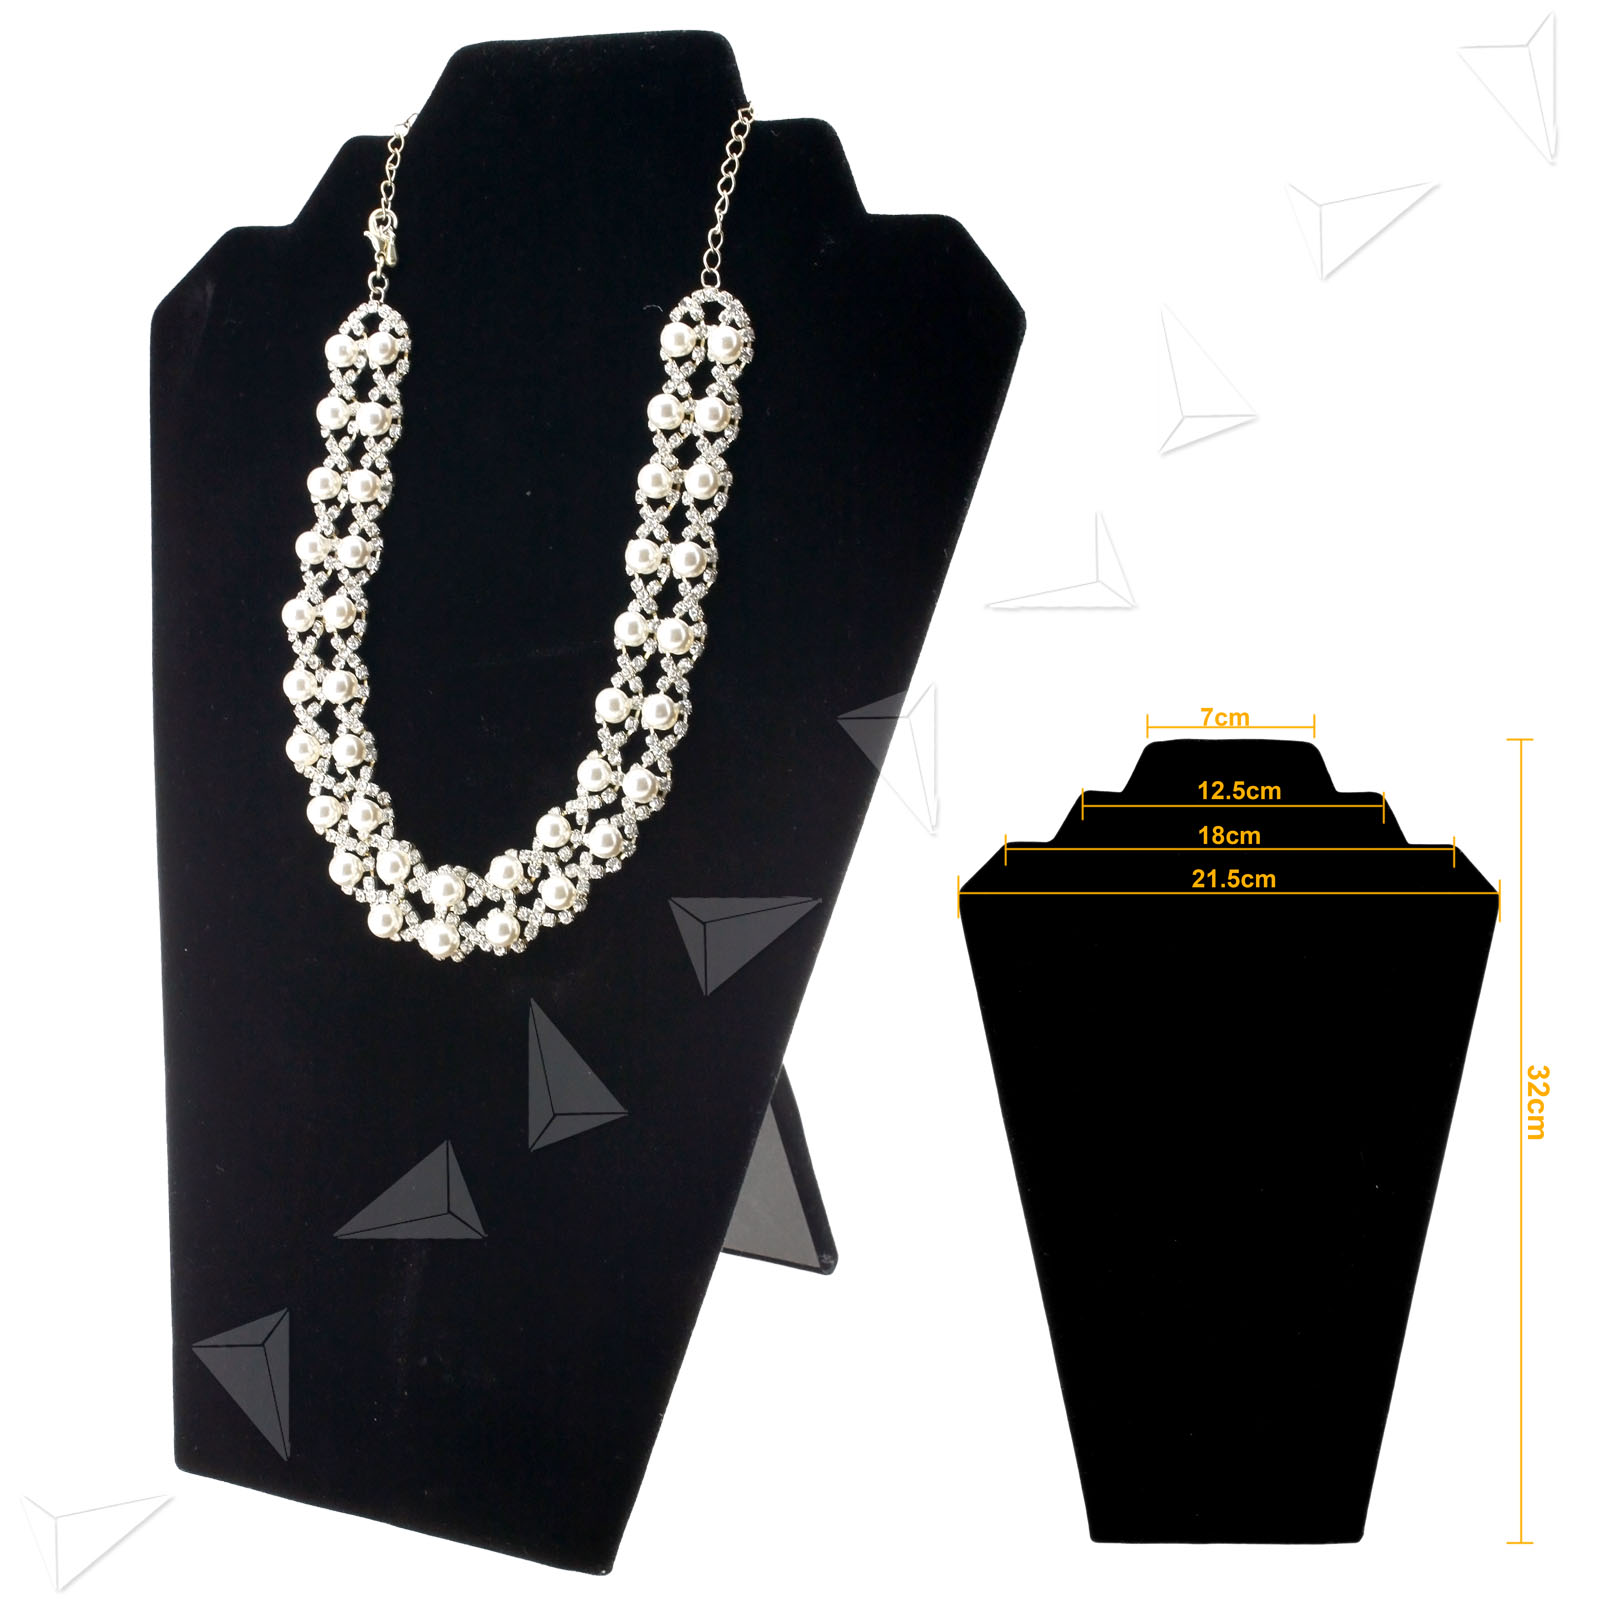 new 2pcs multiple velvet chain jewelry necklace shop. Black Bedroom Furniture Sets. Home Design Ideas